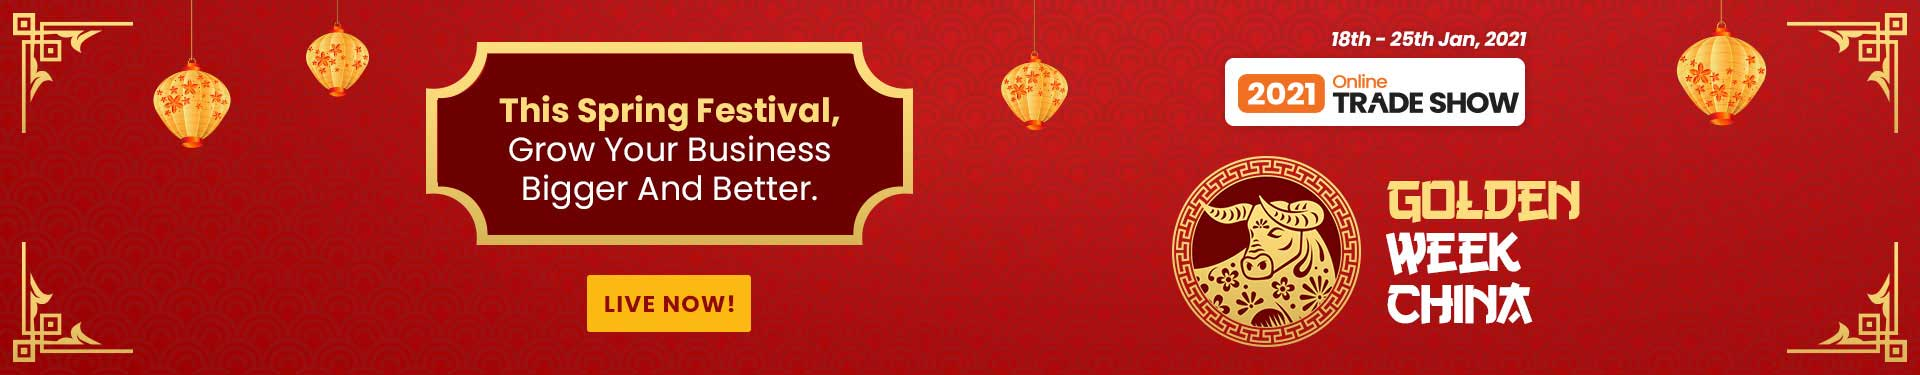 Golden Week China Event - Biggest Online B2B Trade Event 2021